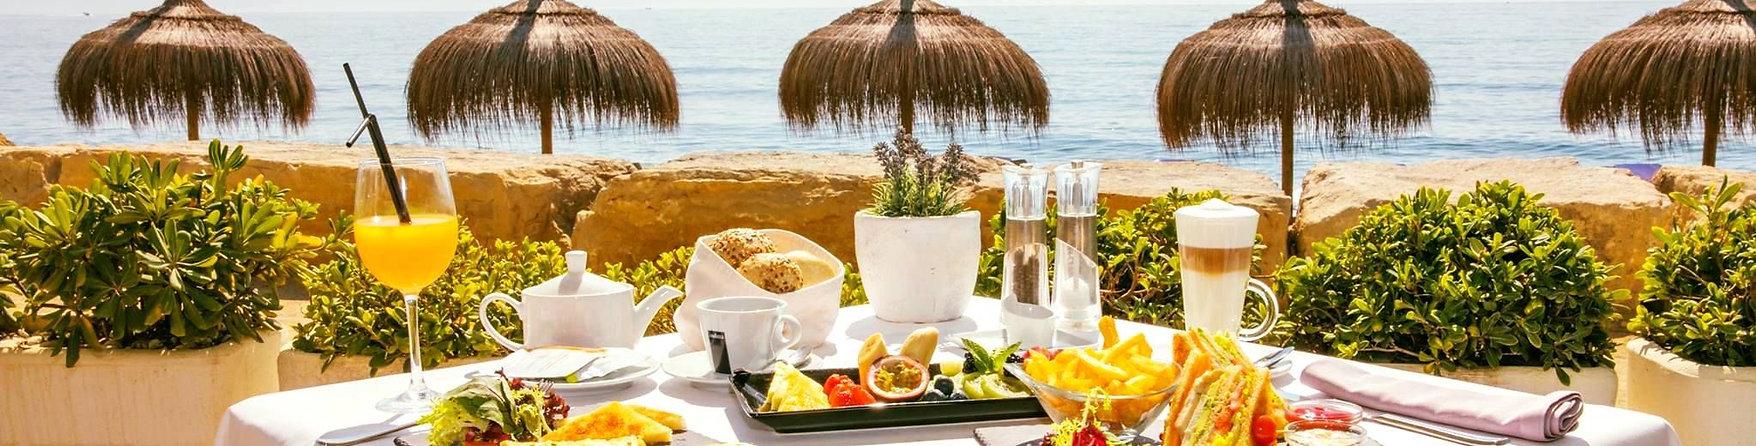 restaurants-marbella-besaya-beach